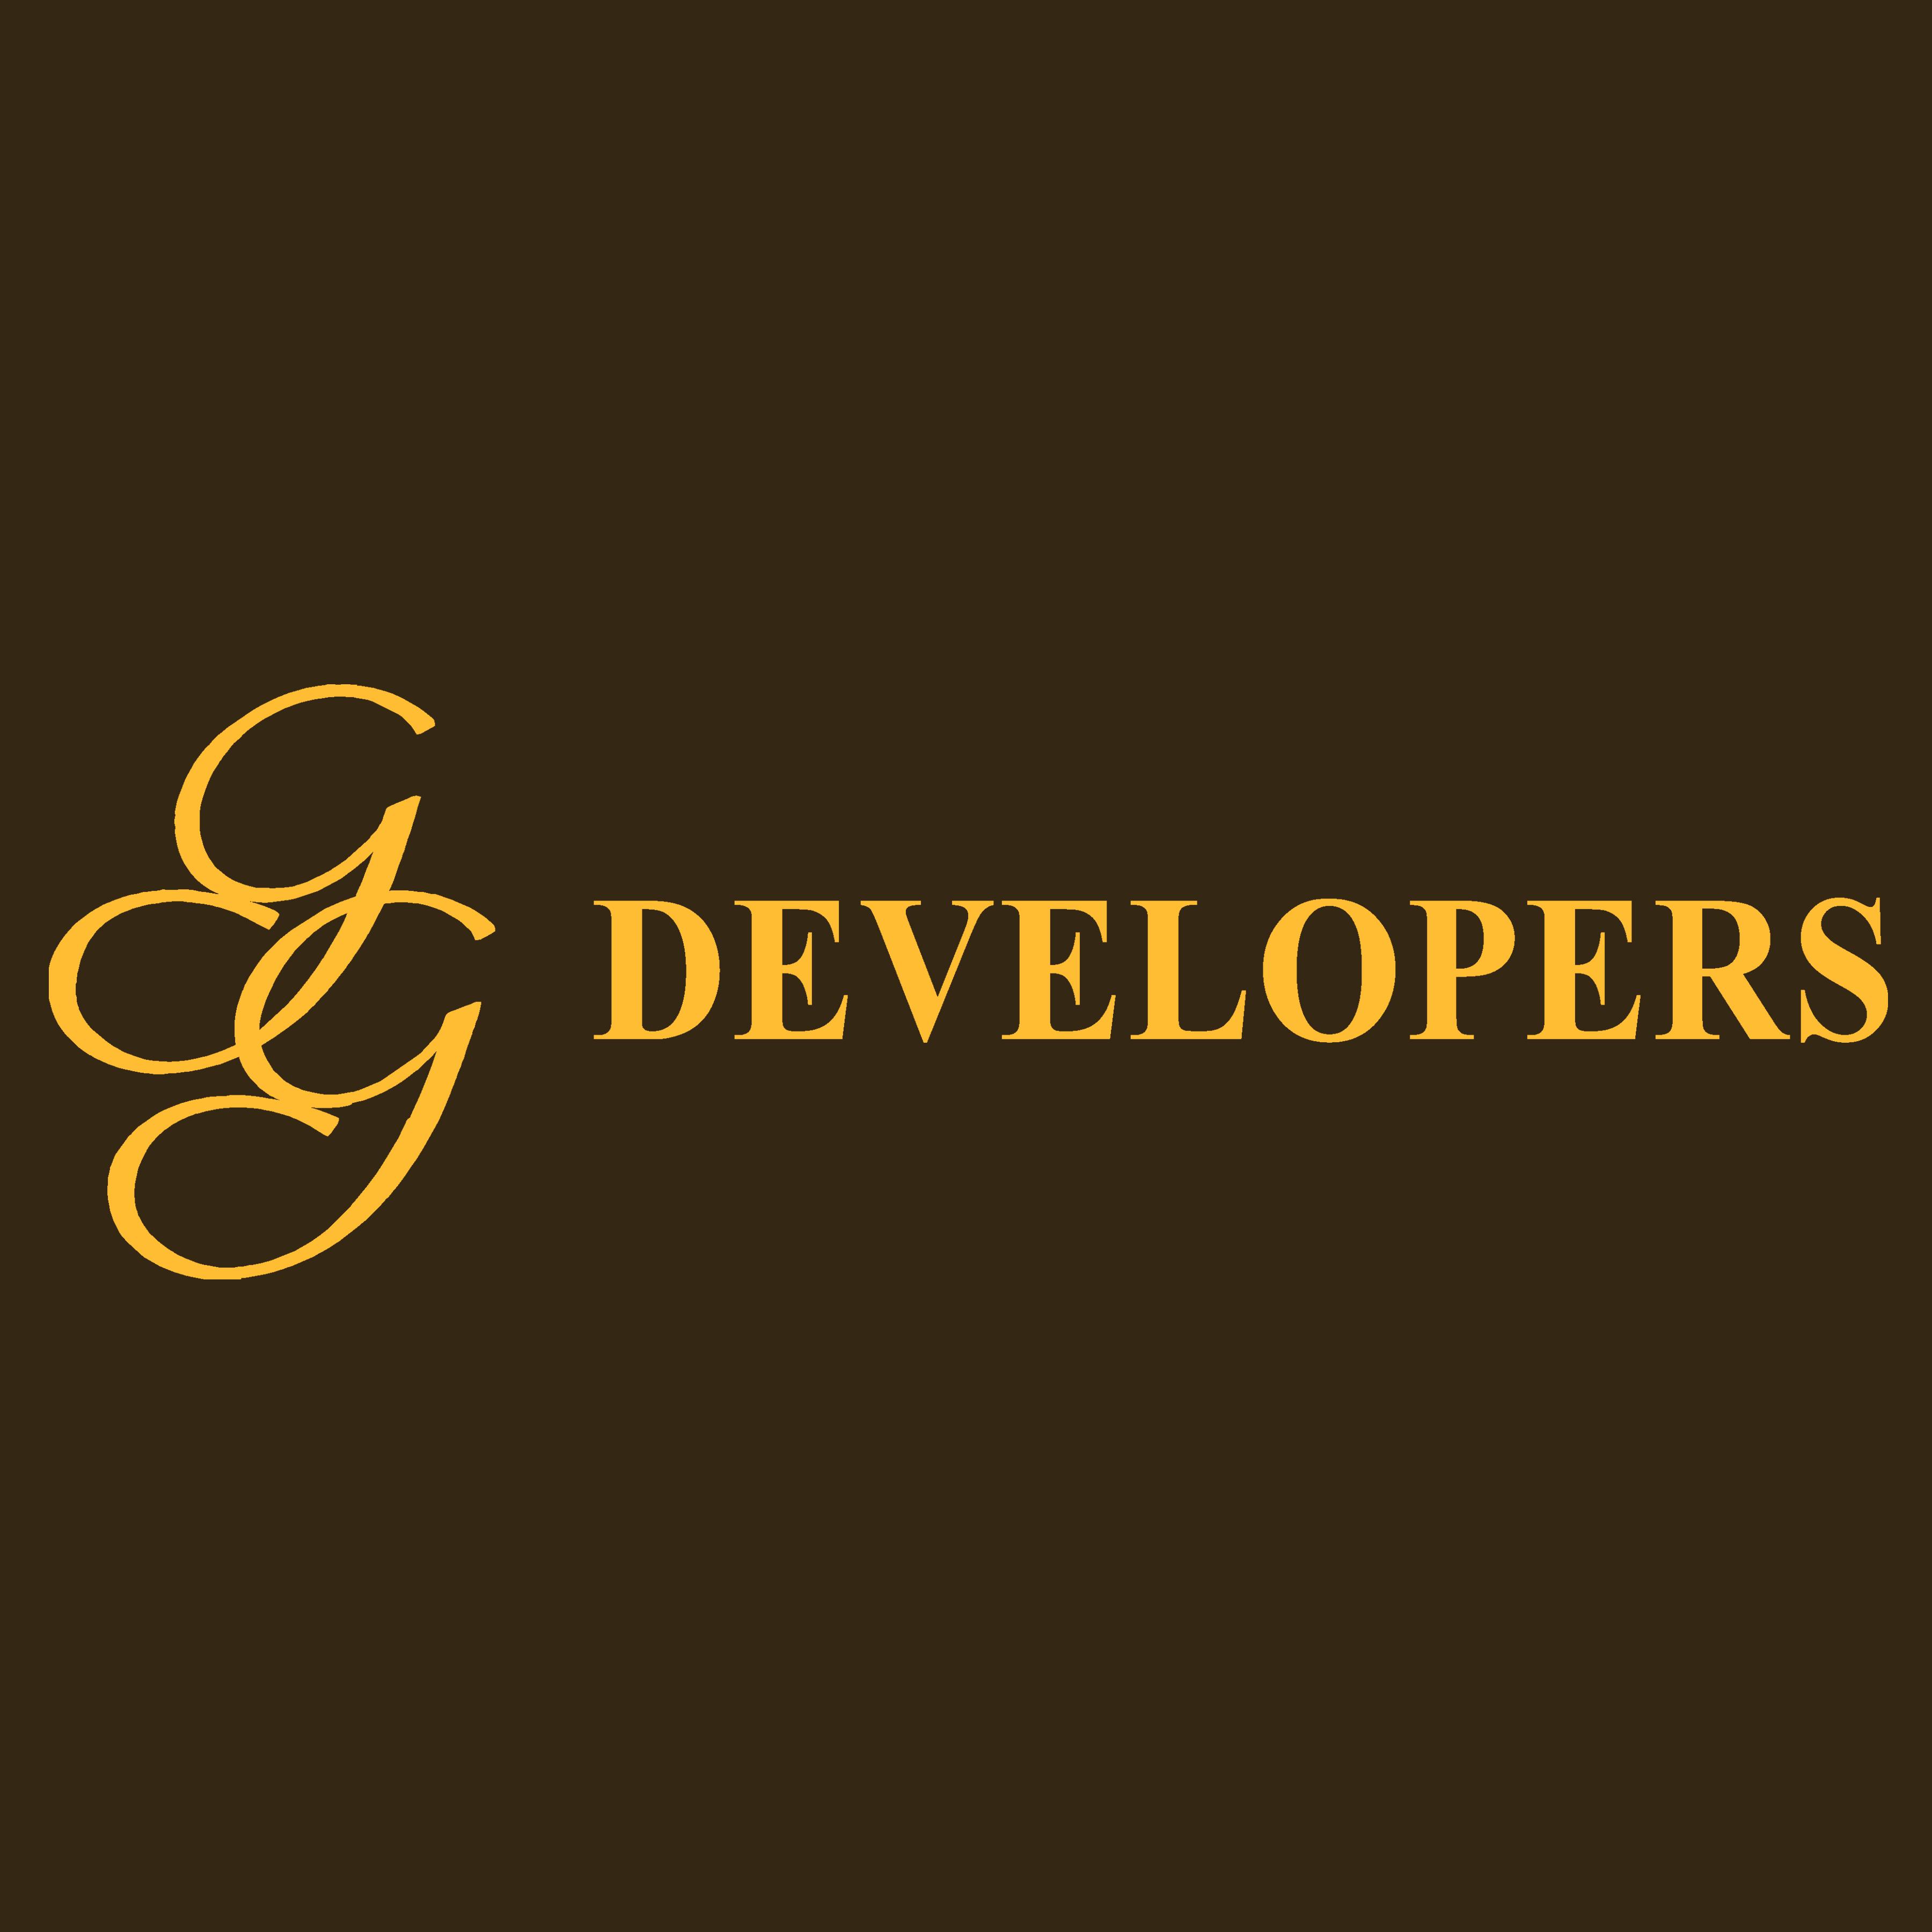 GG Developers